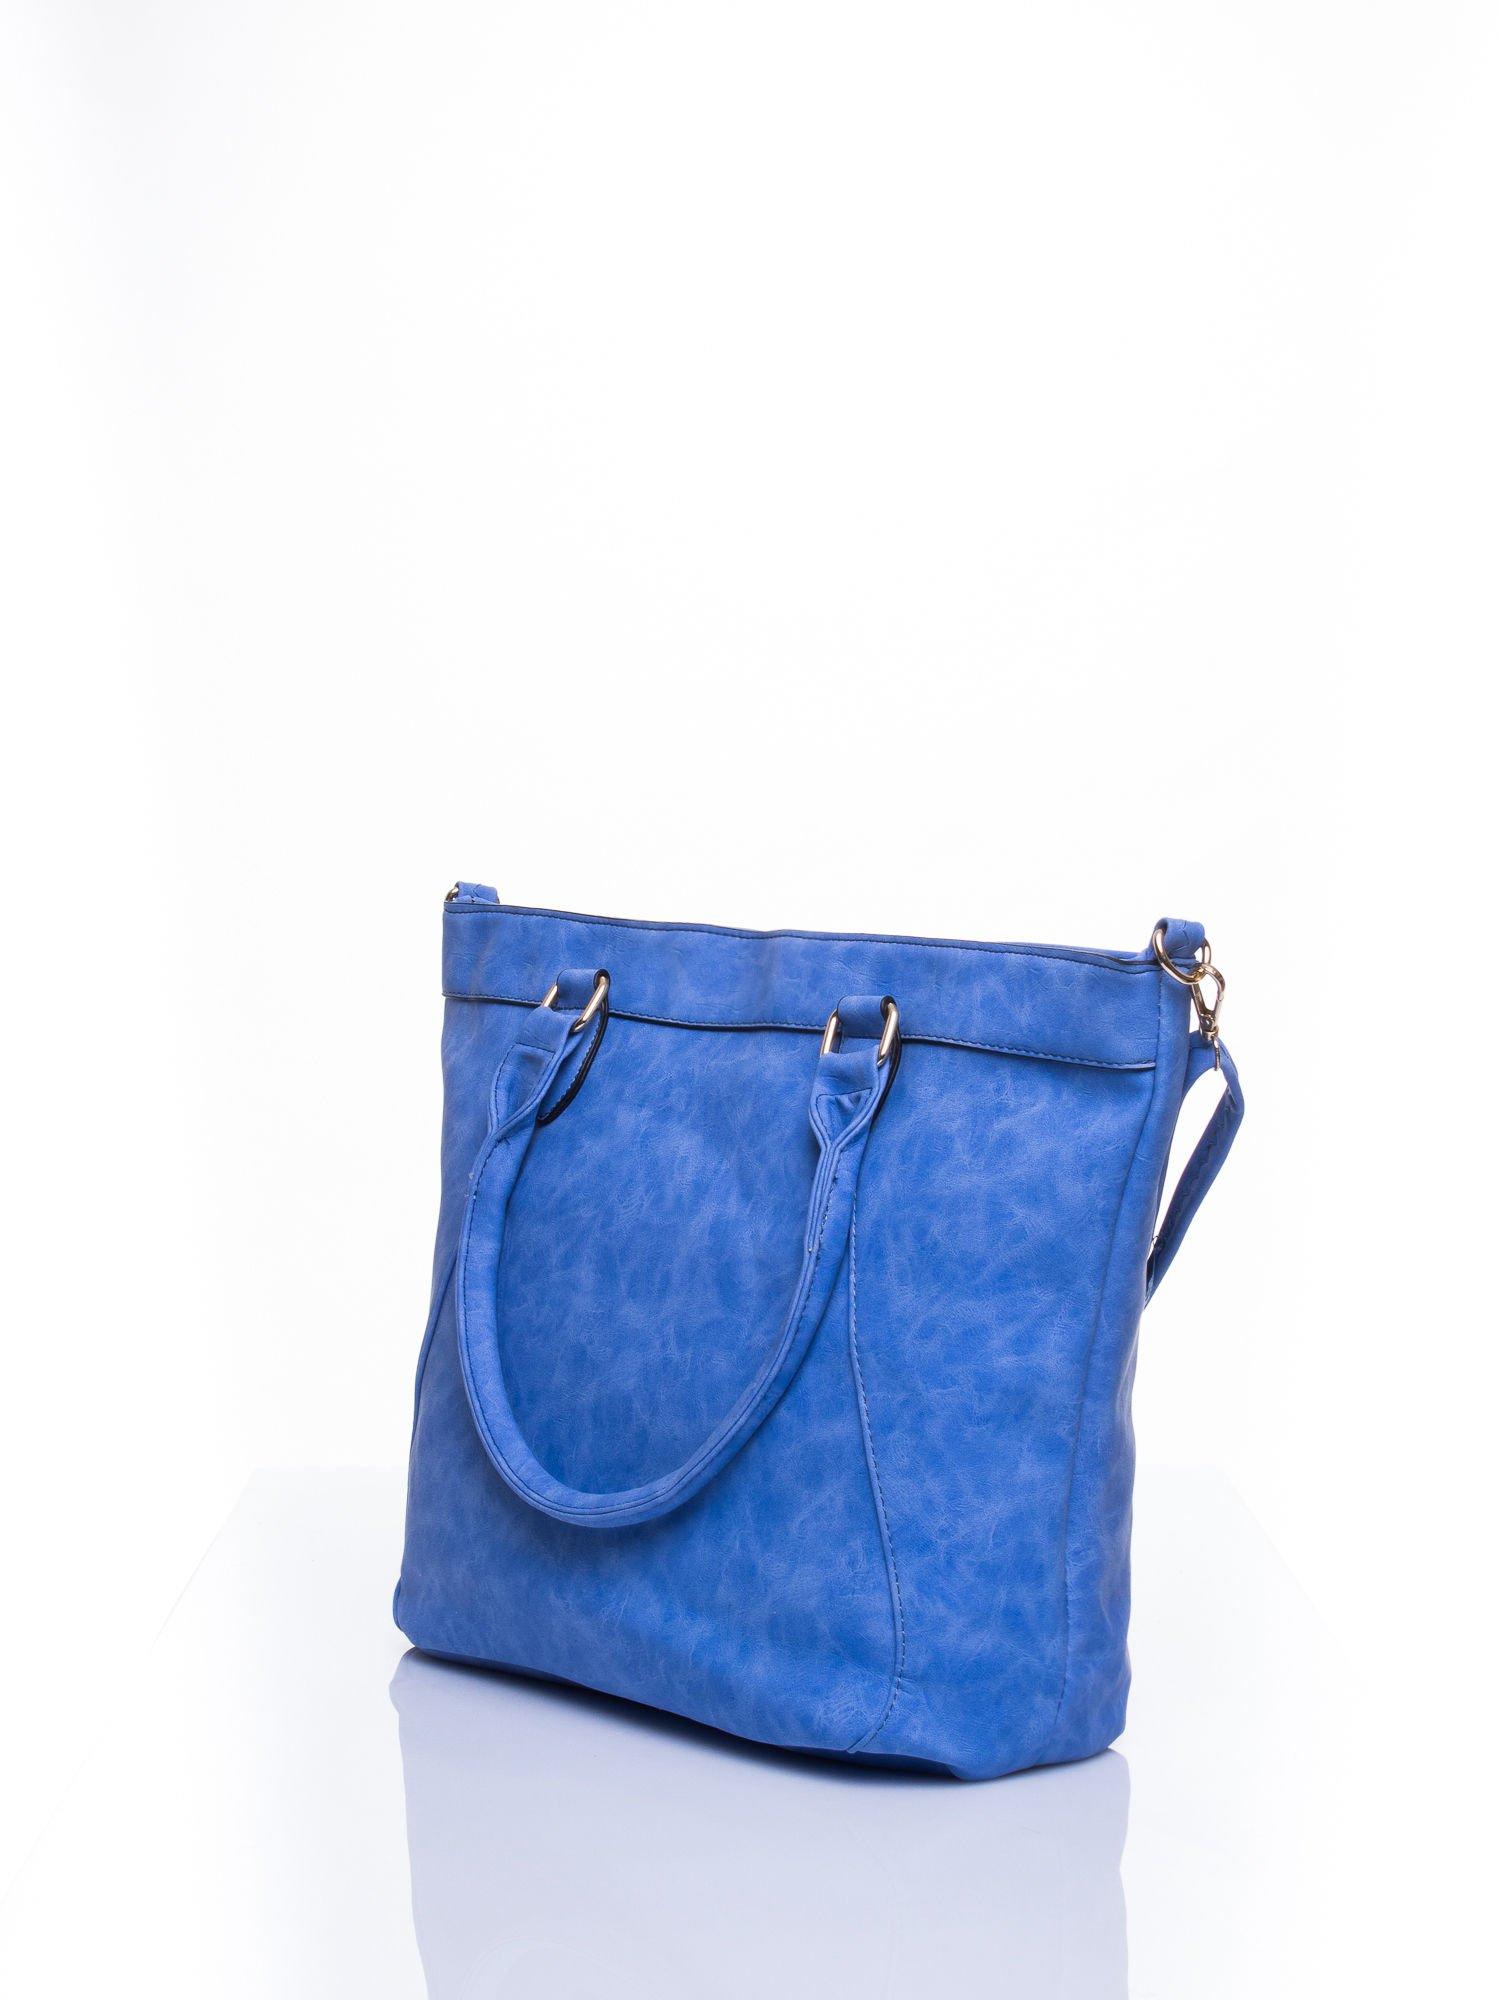 Niebieska torba city bag na ramię                                  zdj.                                  4